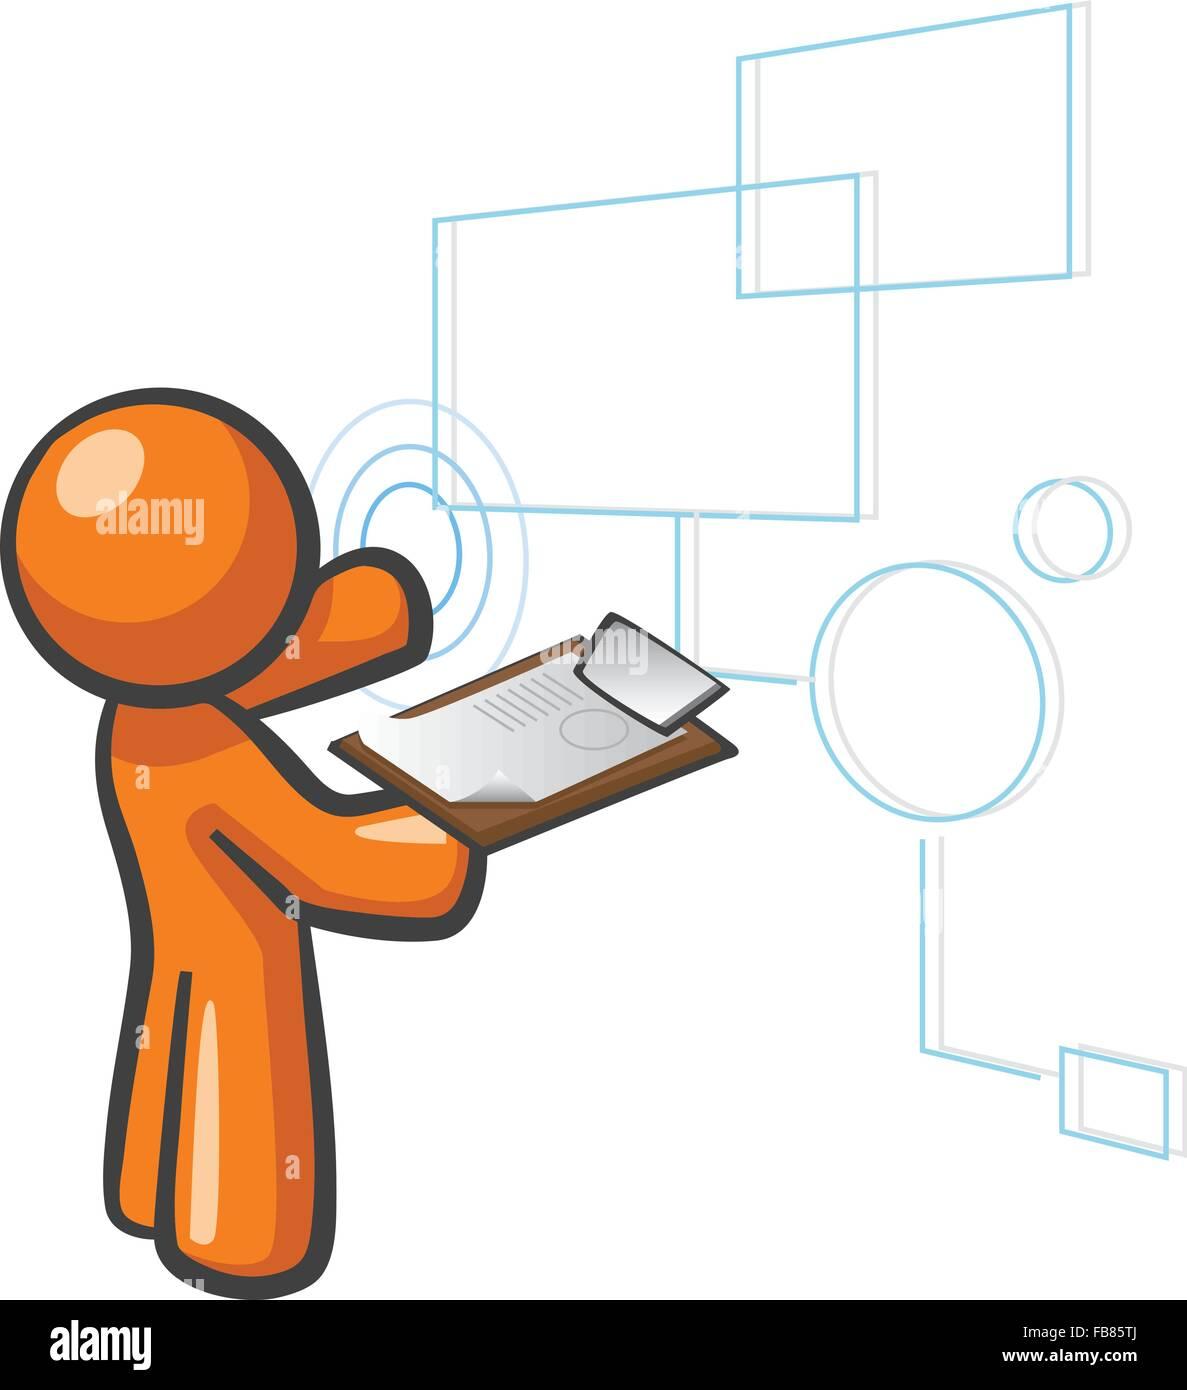 Orange Man databases concept, organizing/managing data and content. - Stock Image